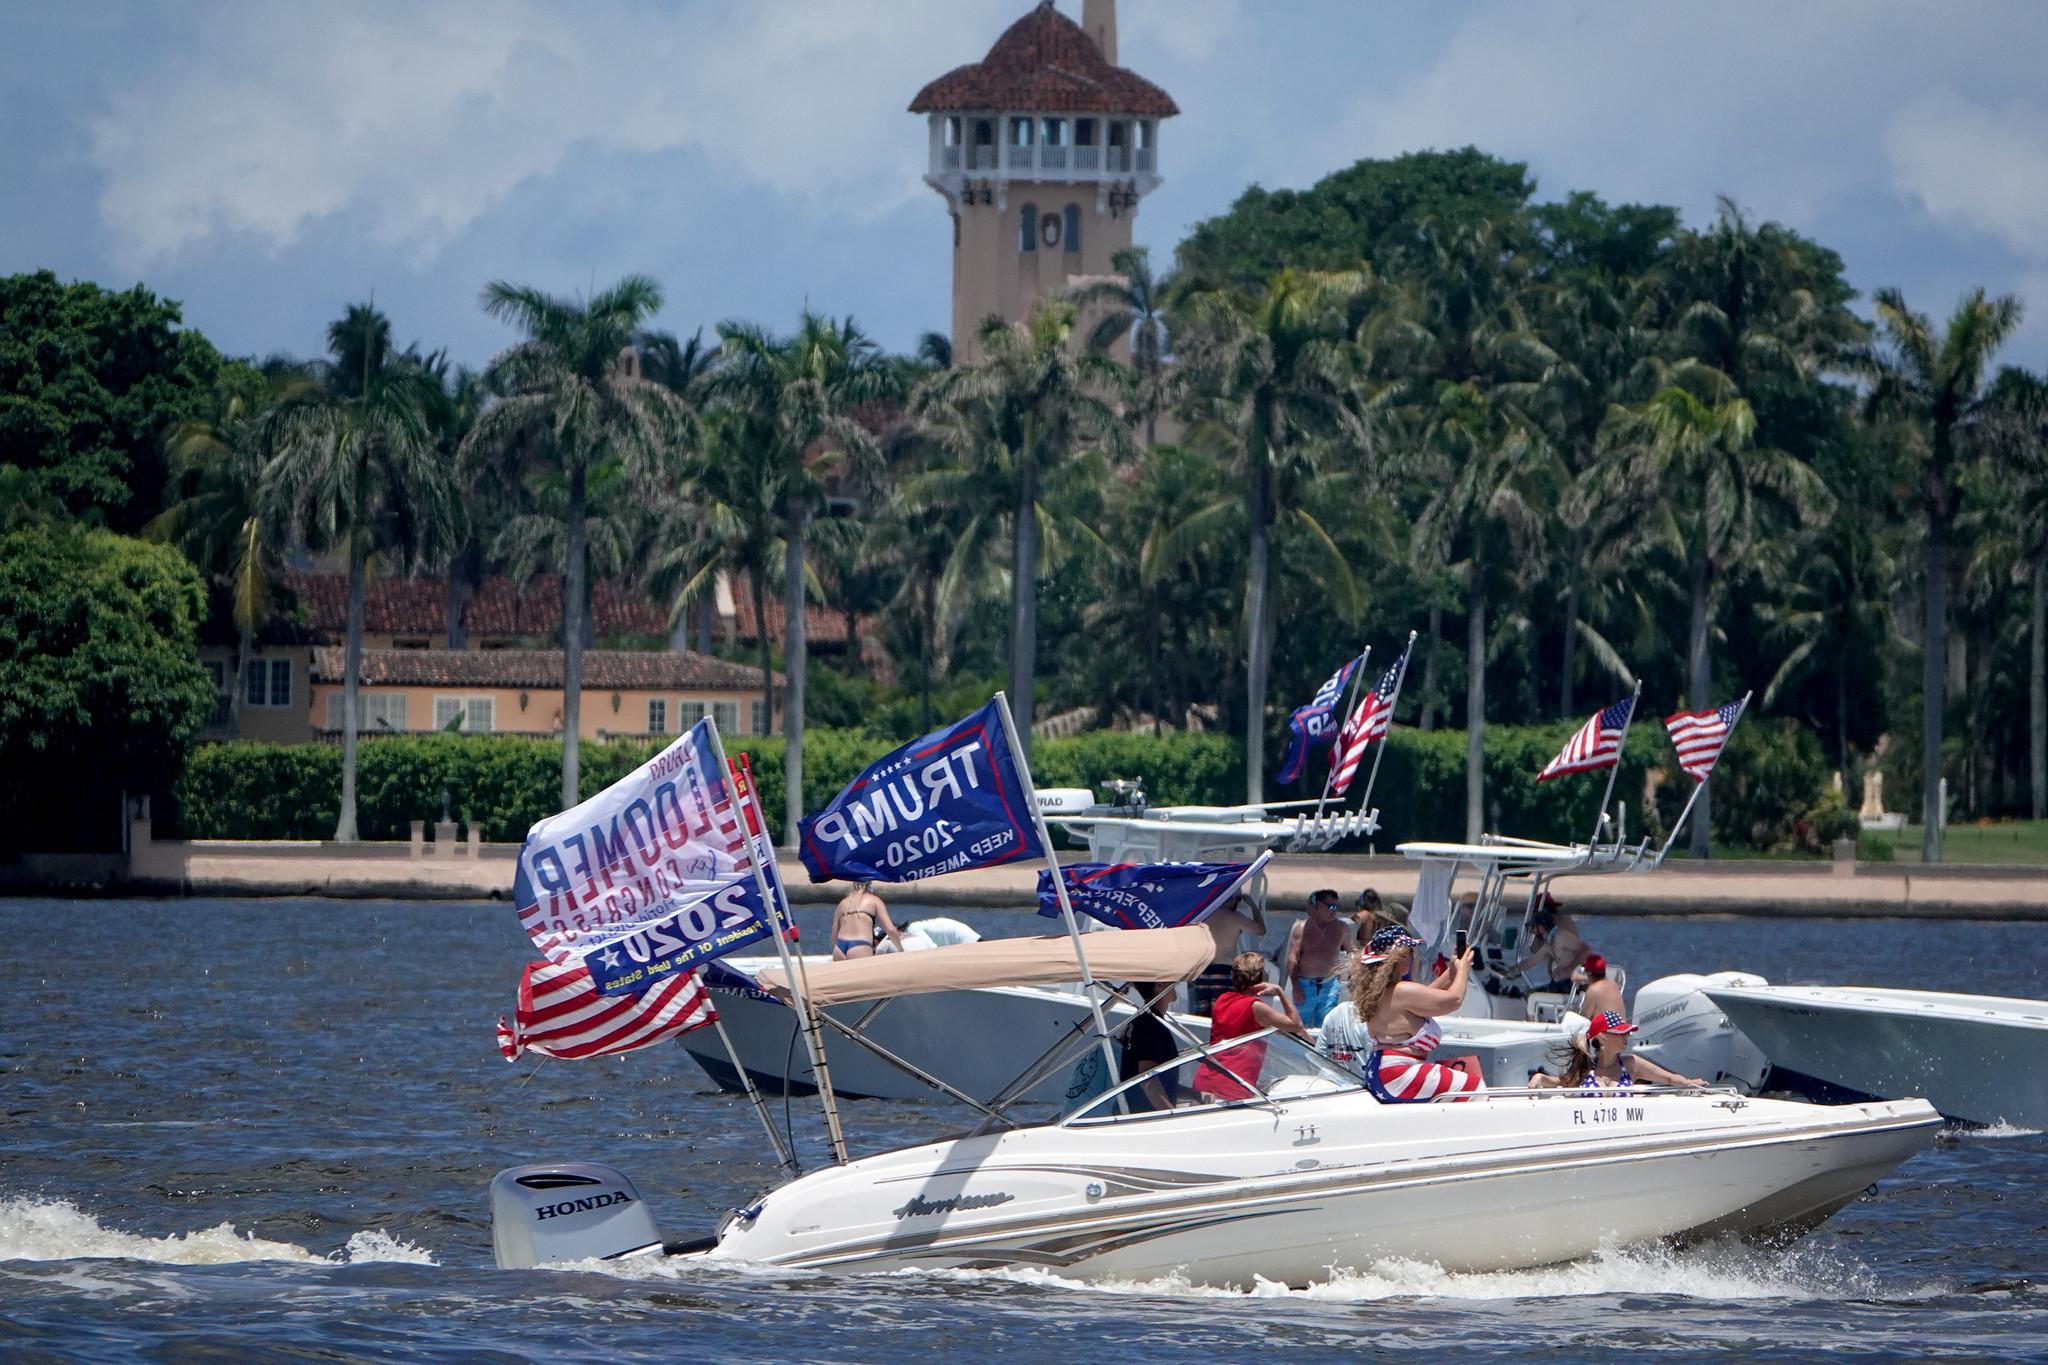 Donald Trump Joe Biden Supporters Rally On President S Birthday South Florida Sun Sentinel